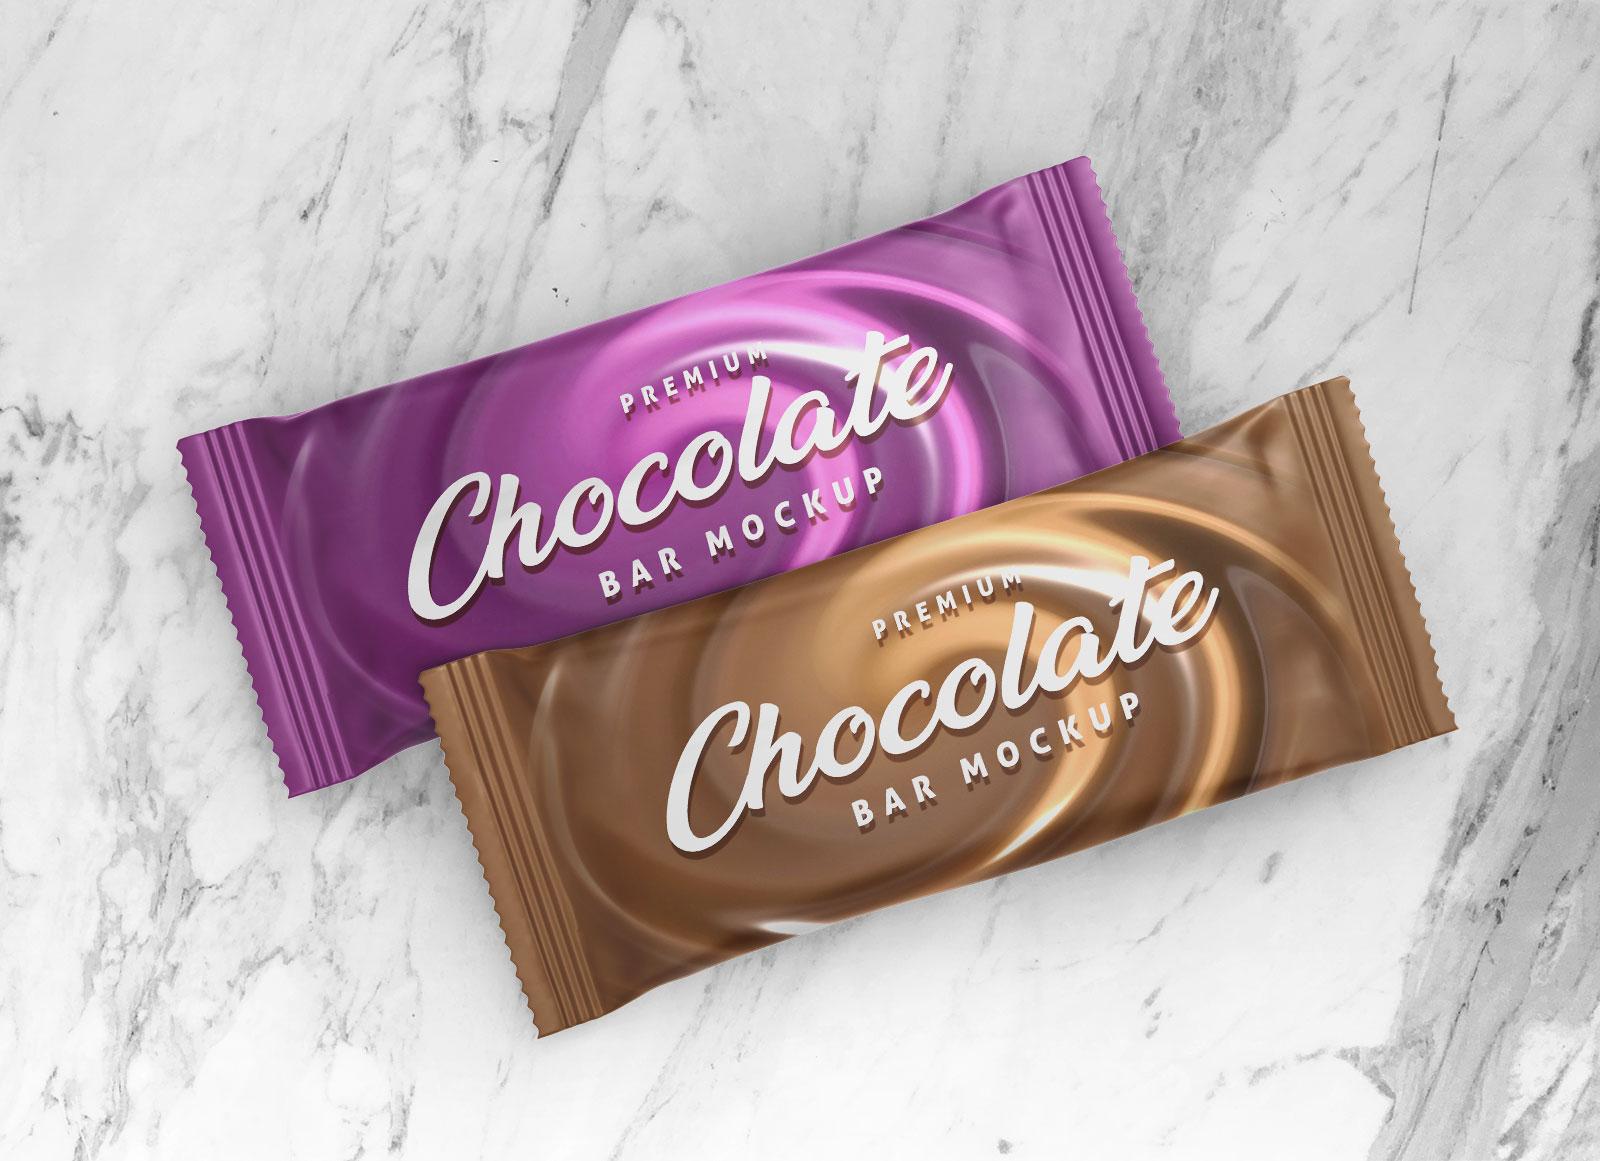 Free Chocolate Bar 2 Packaging Mockup Free Package Mockups